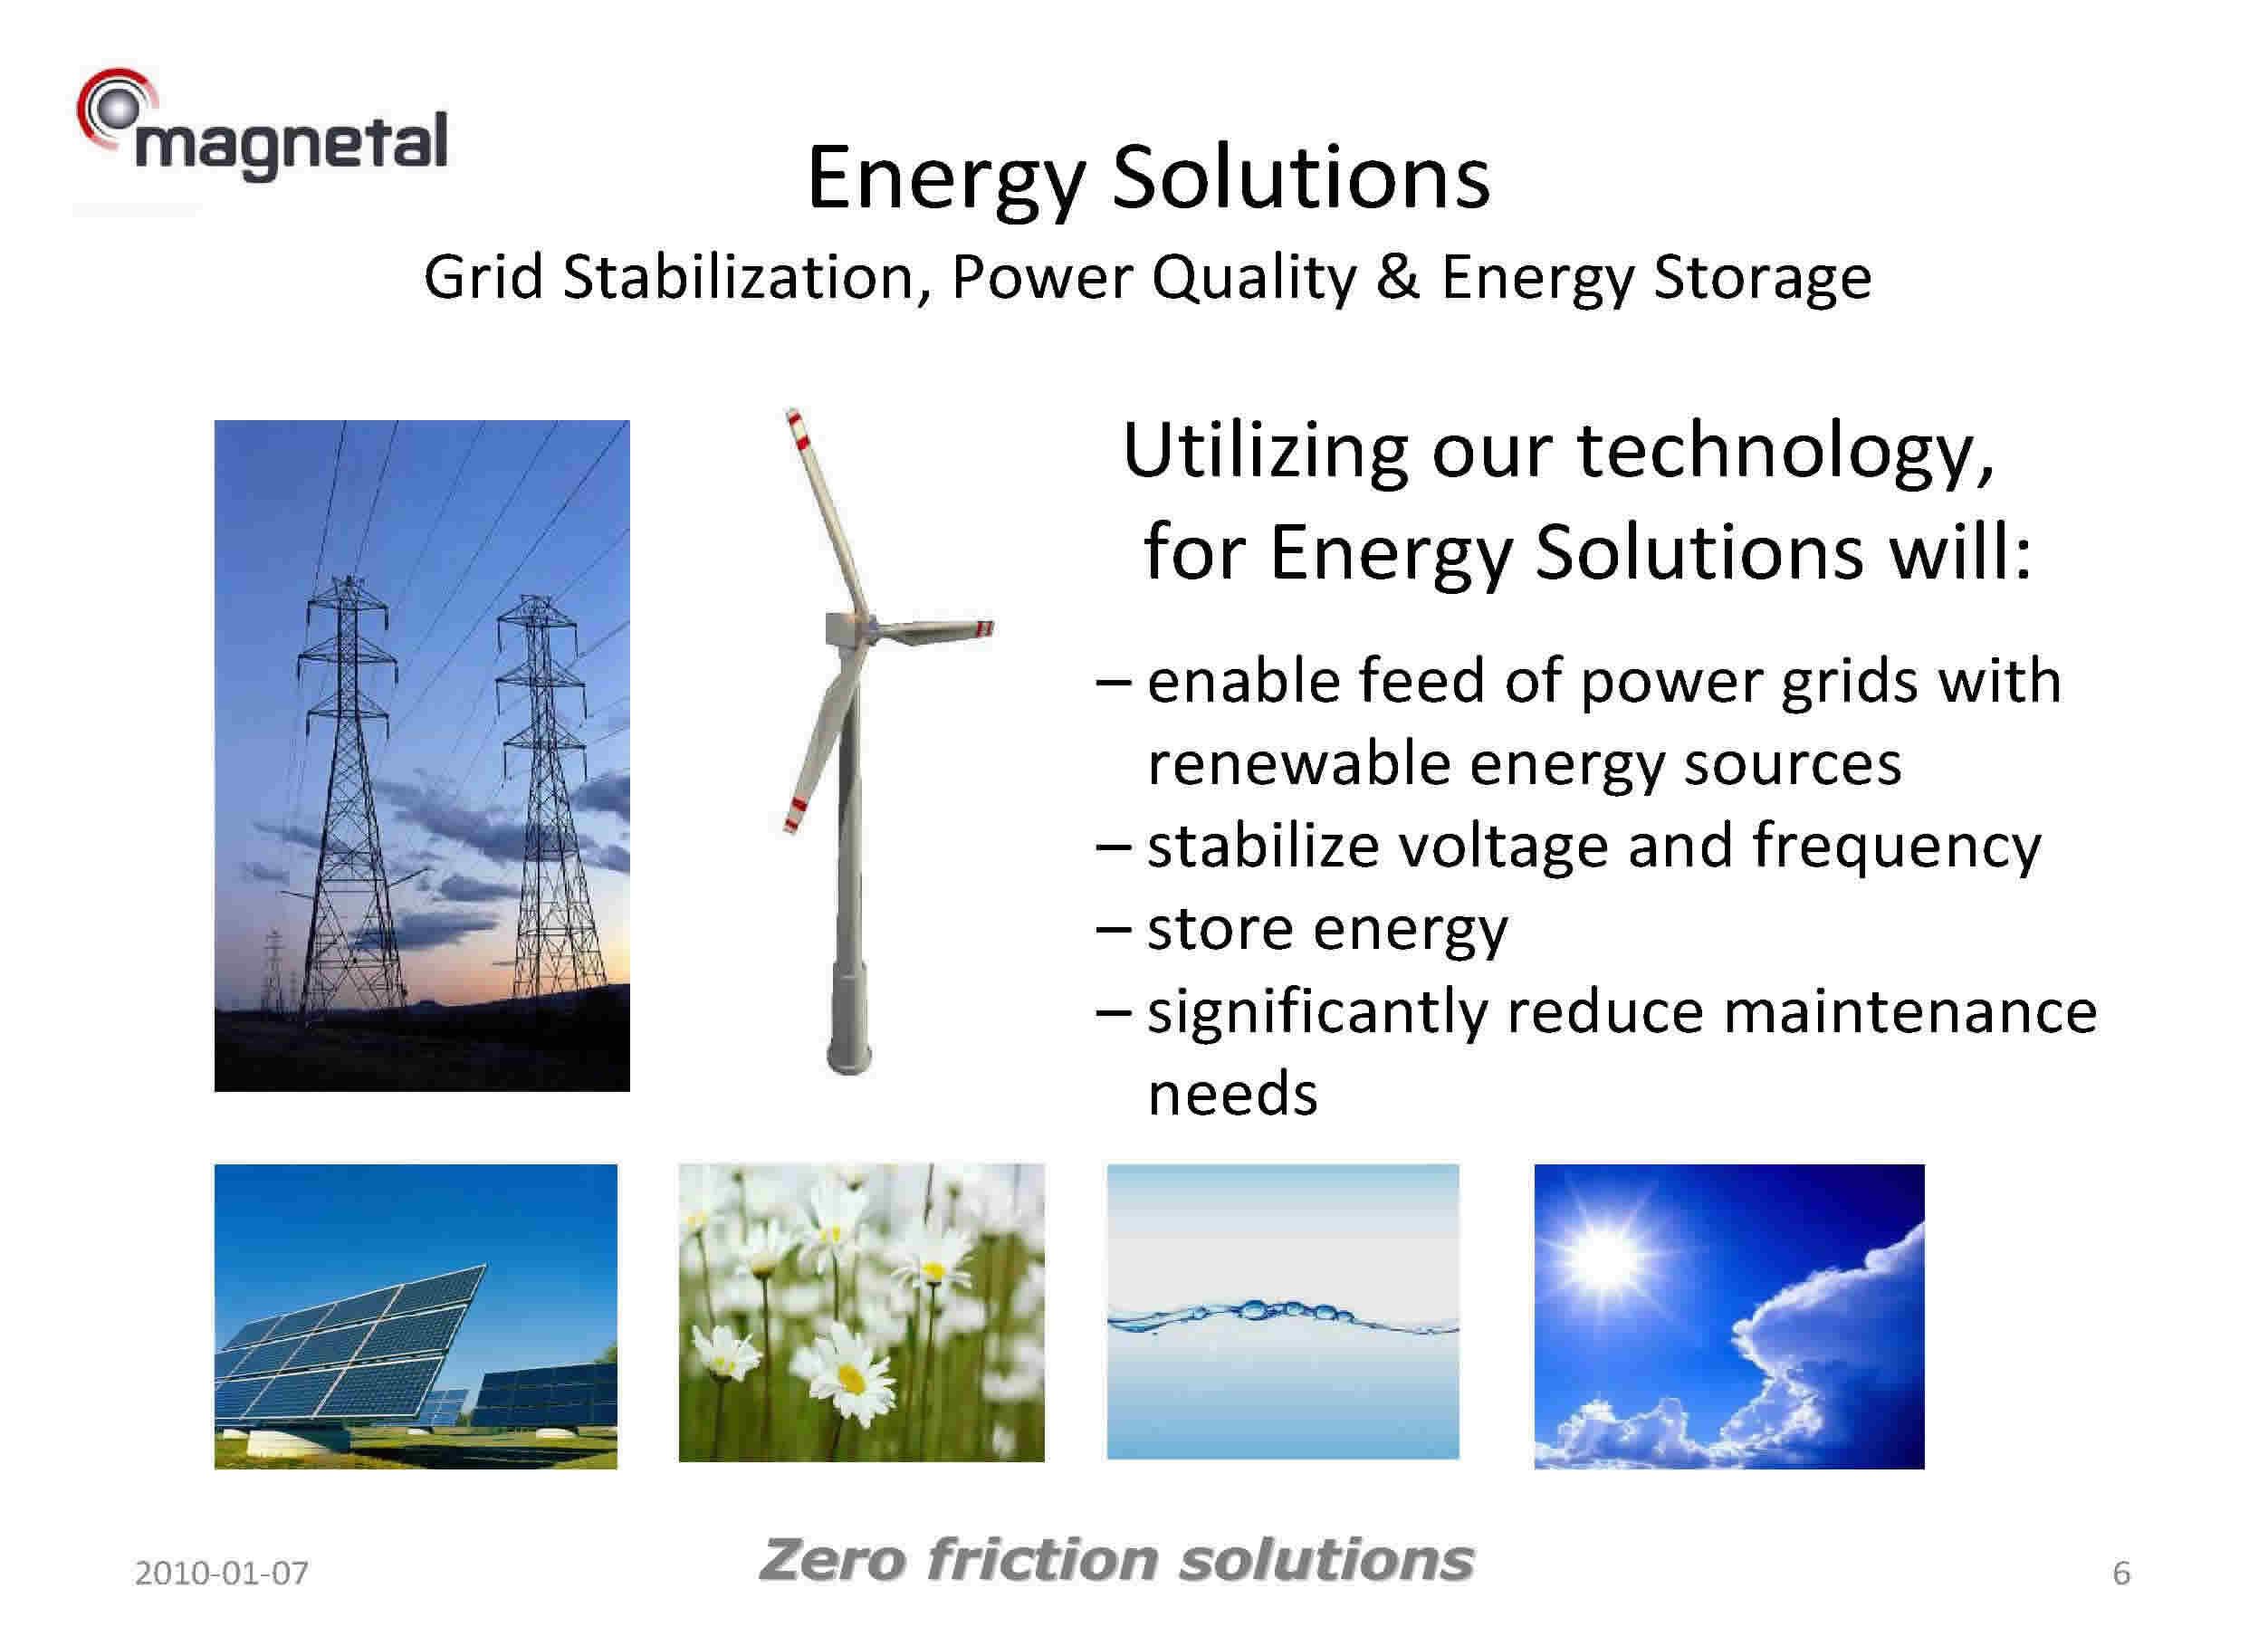 phd thesis renewable energy